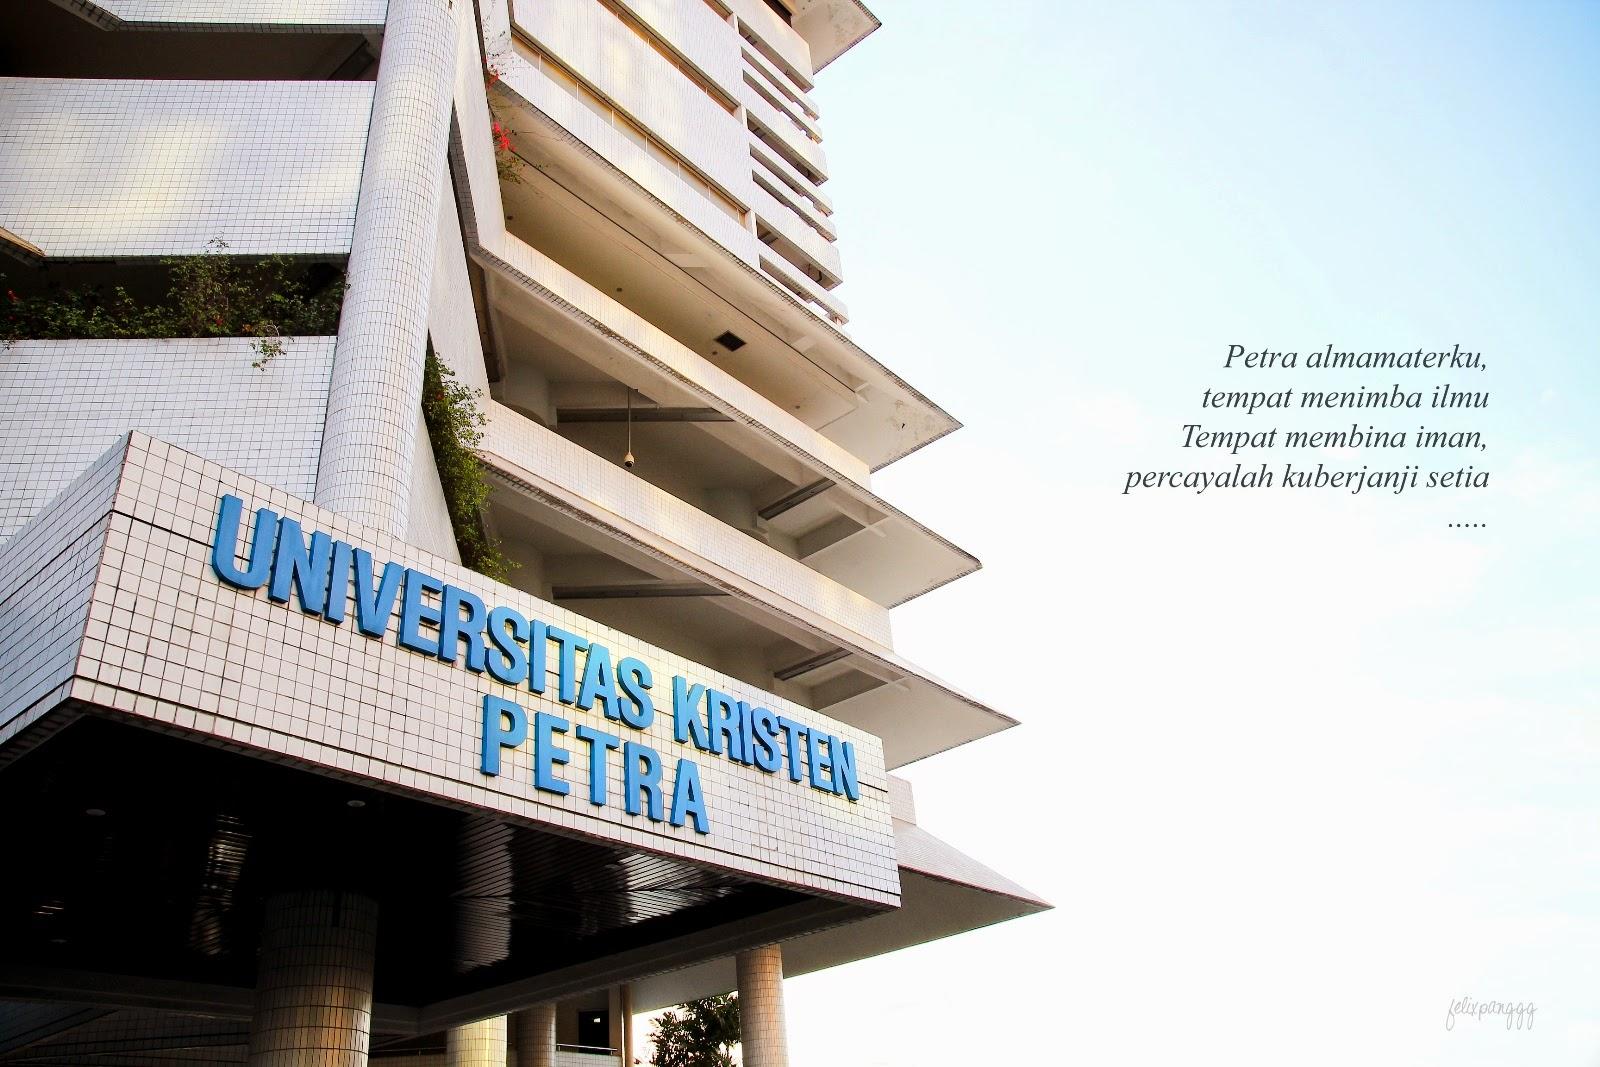 Info Persyaratan – Pendaftaran Universitas Kristen Petra (UP)